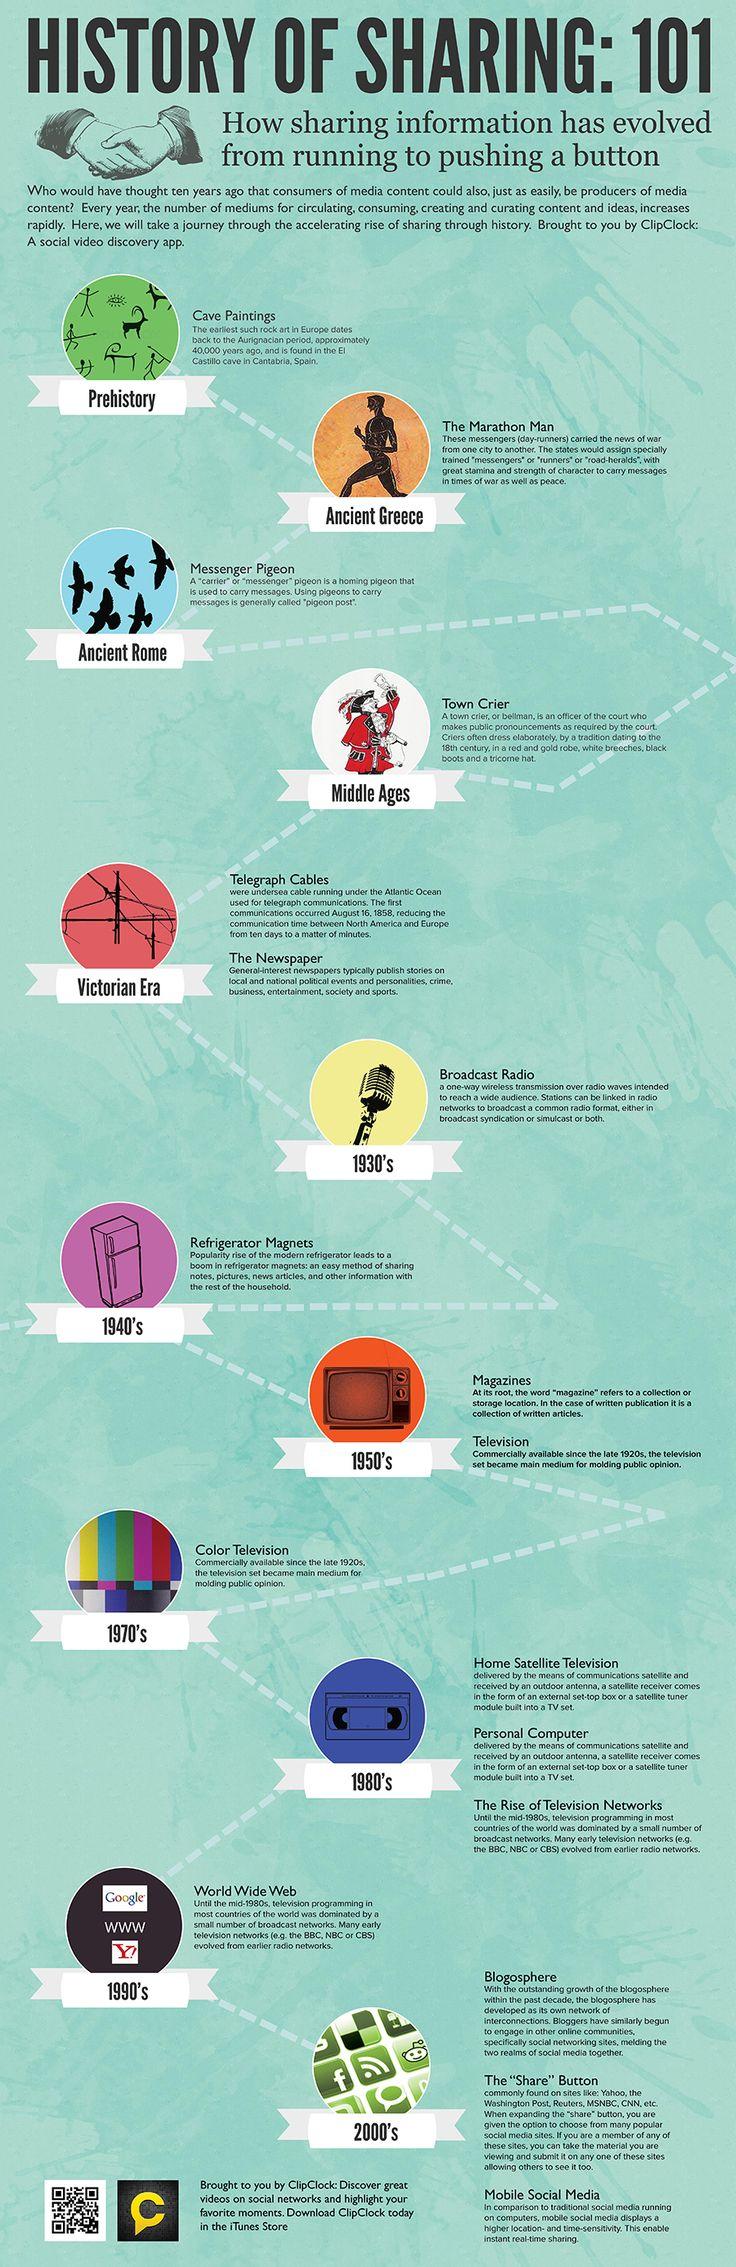 History of Sharing Information:101